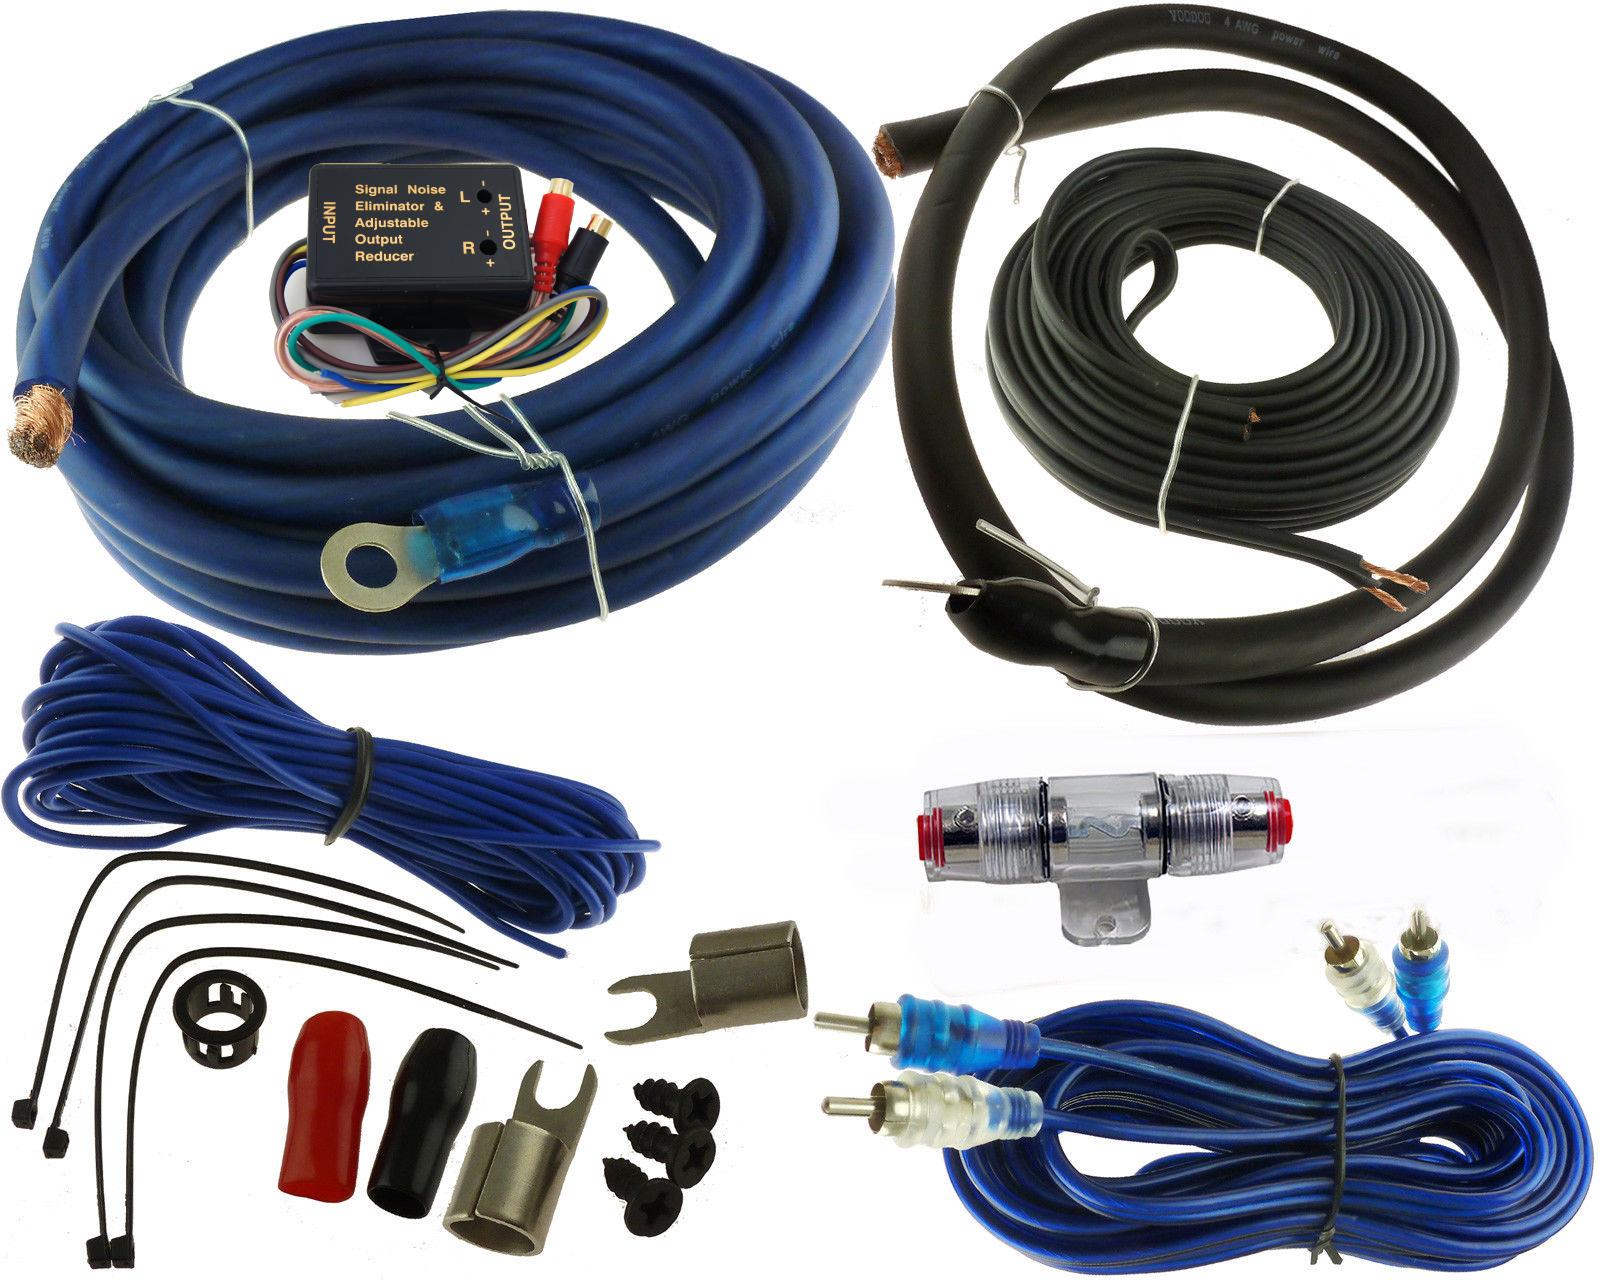 Voodoo 4 Gauge Car Amplifier Installation Wiring Wire Kit Amp + RCA+ ...